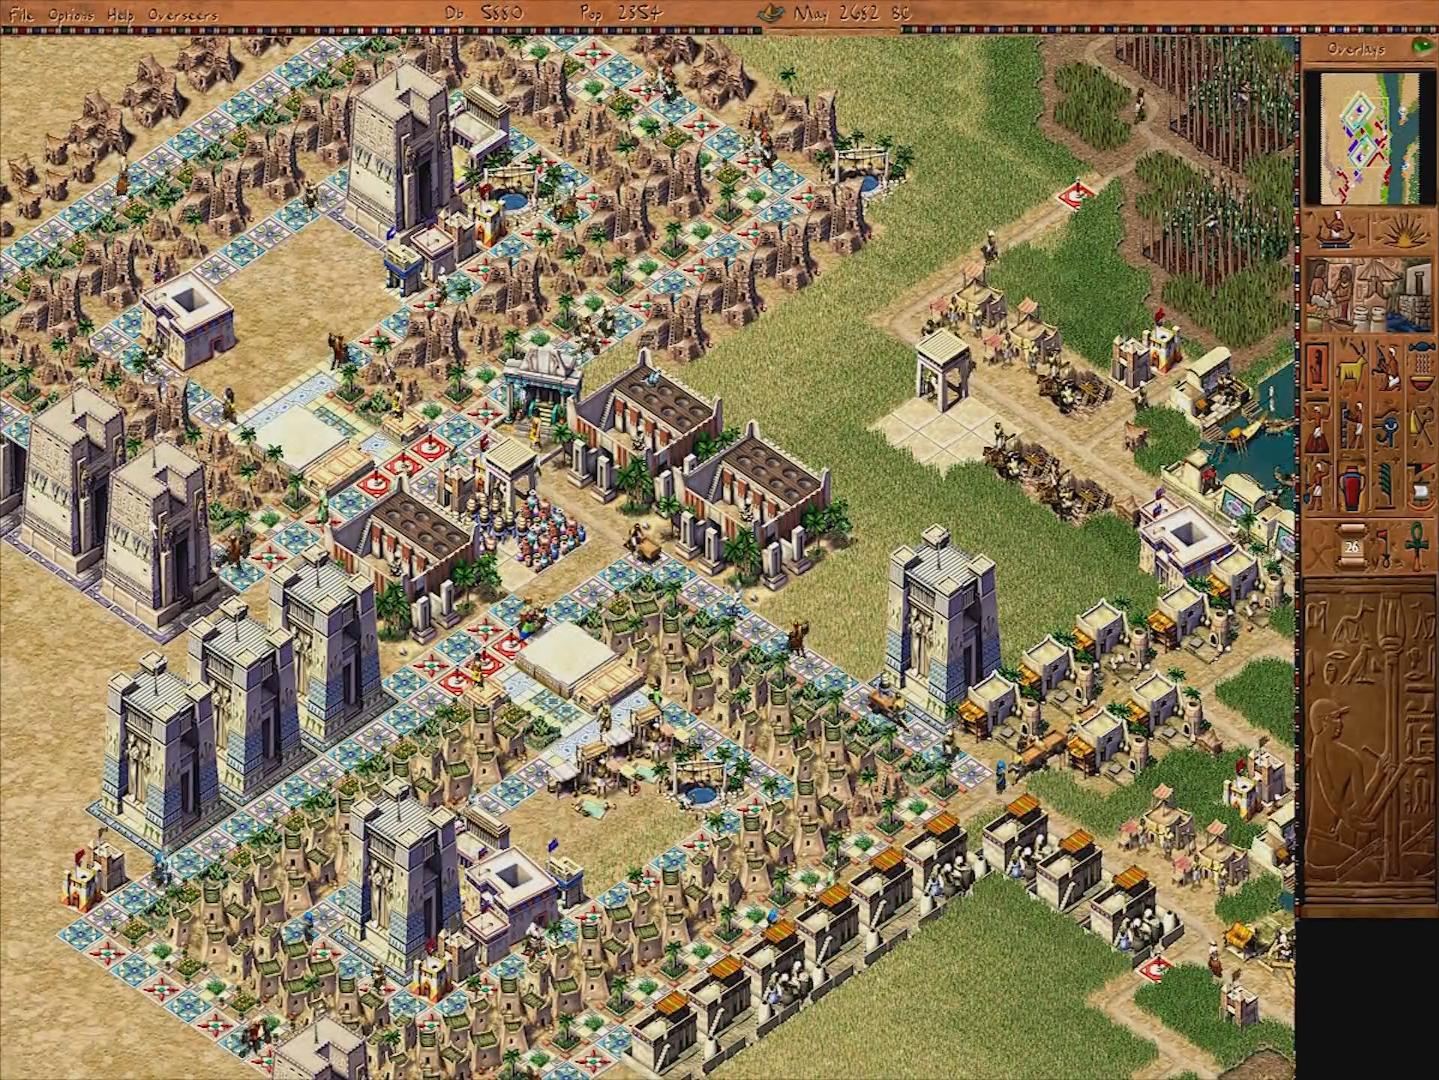 gioco faraon gratis italiano